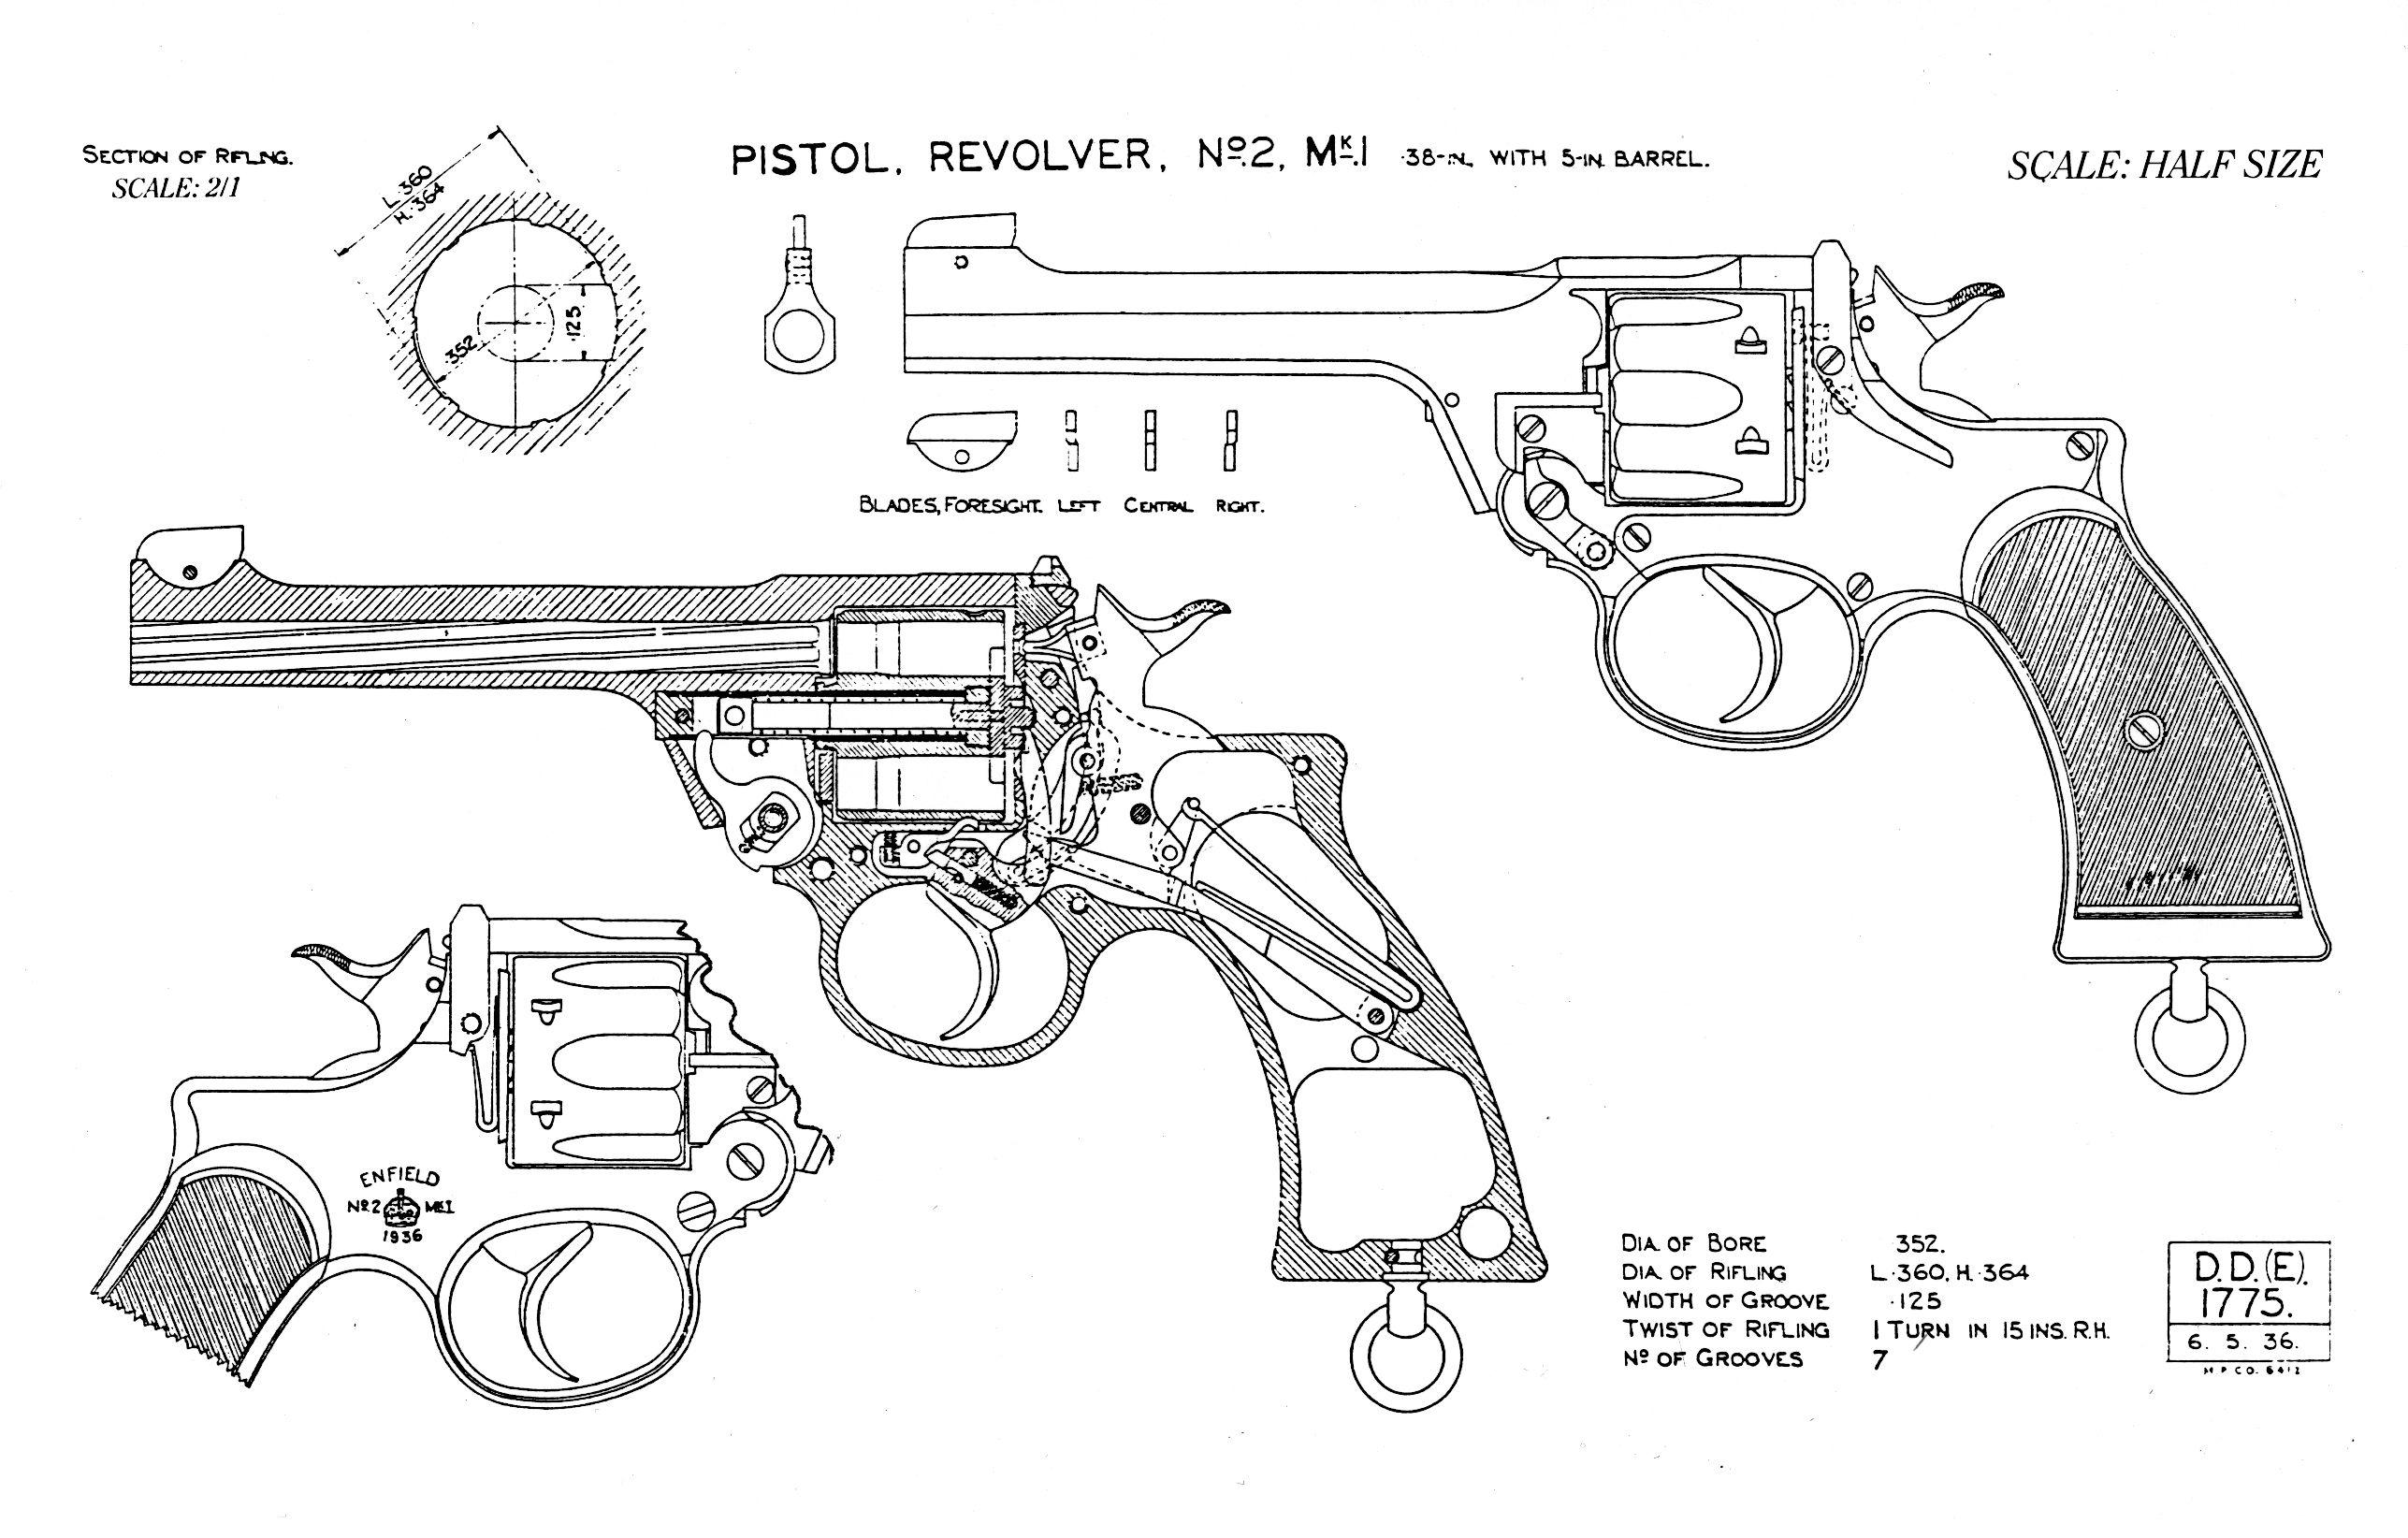 revolver blueprints revolvers revolver, weapons, hand gunsHandgun Diagram For Pinterest #6